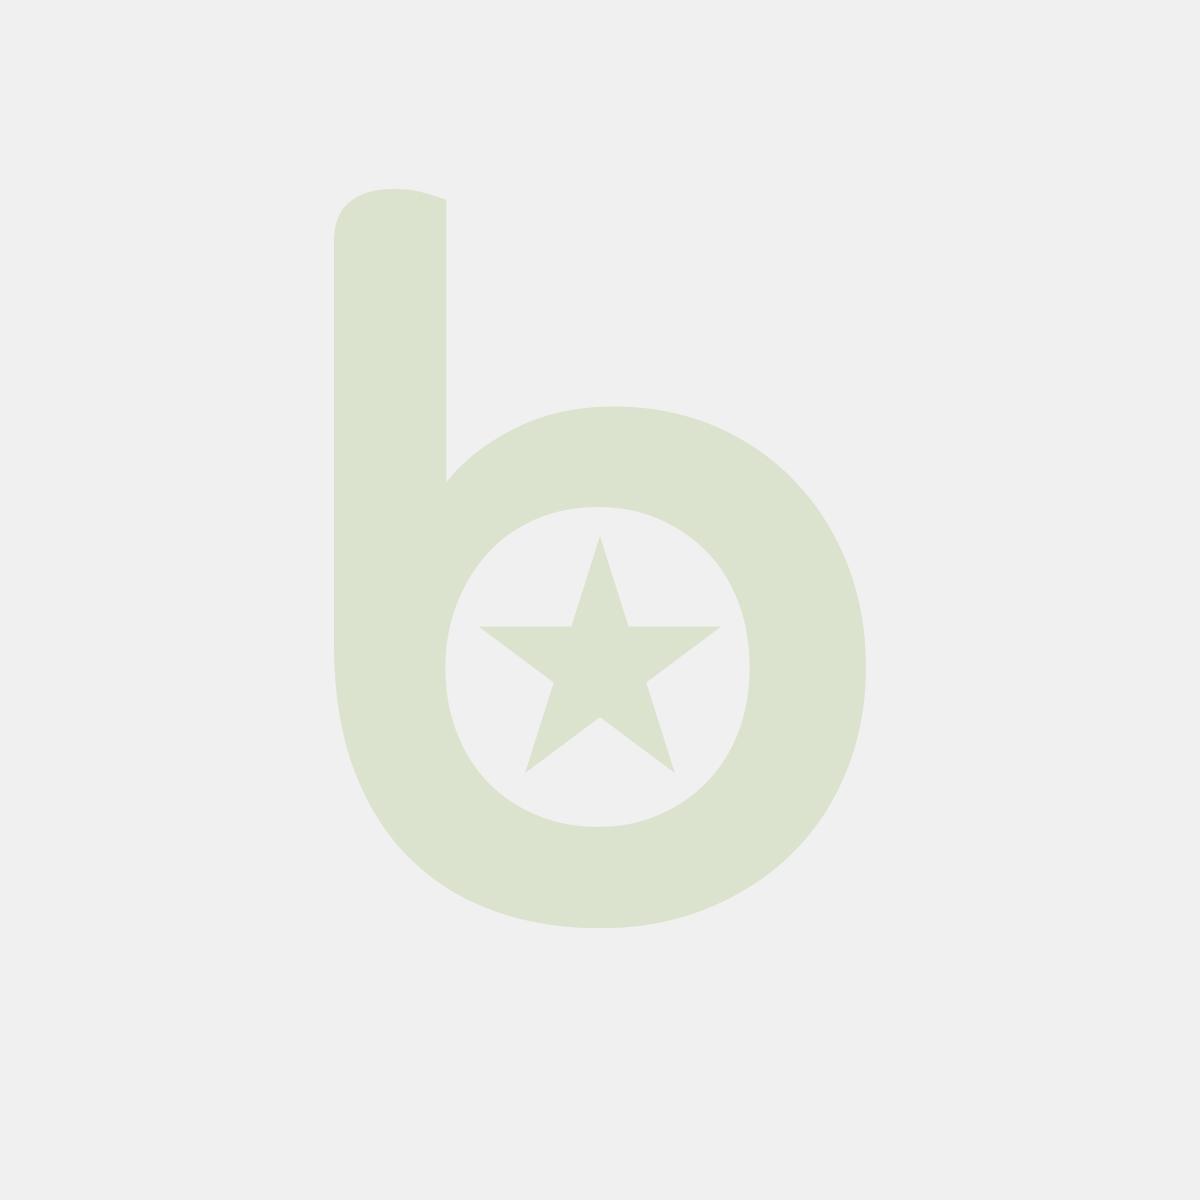 Kołonotatnik A5 80 kartek w kratkę OXFORD